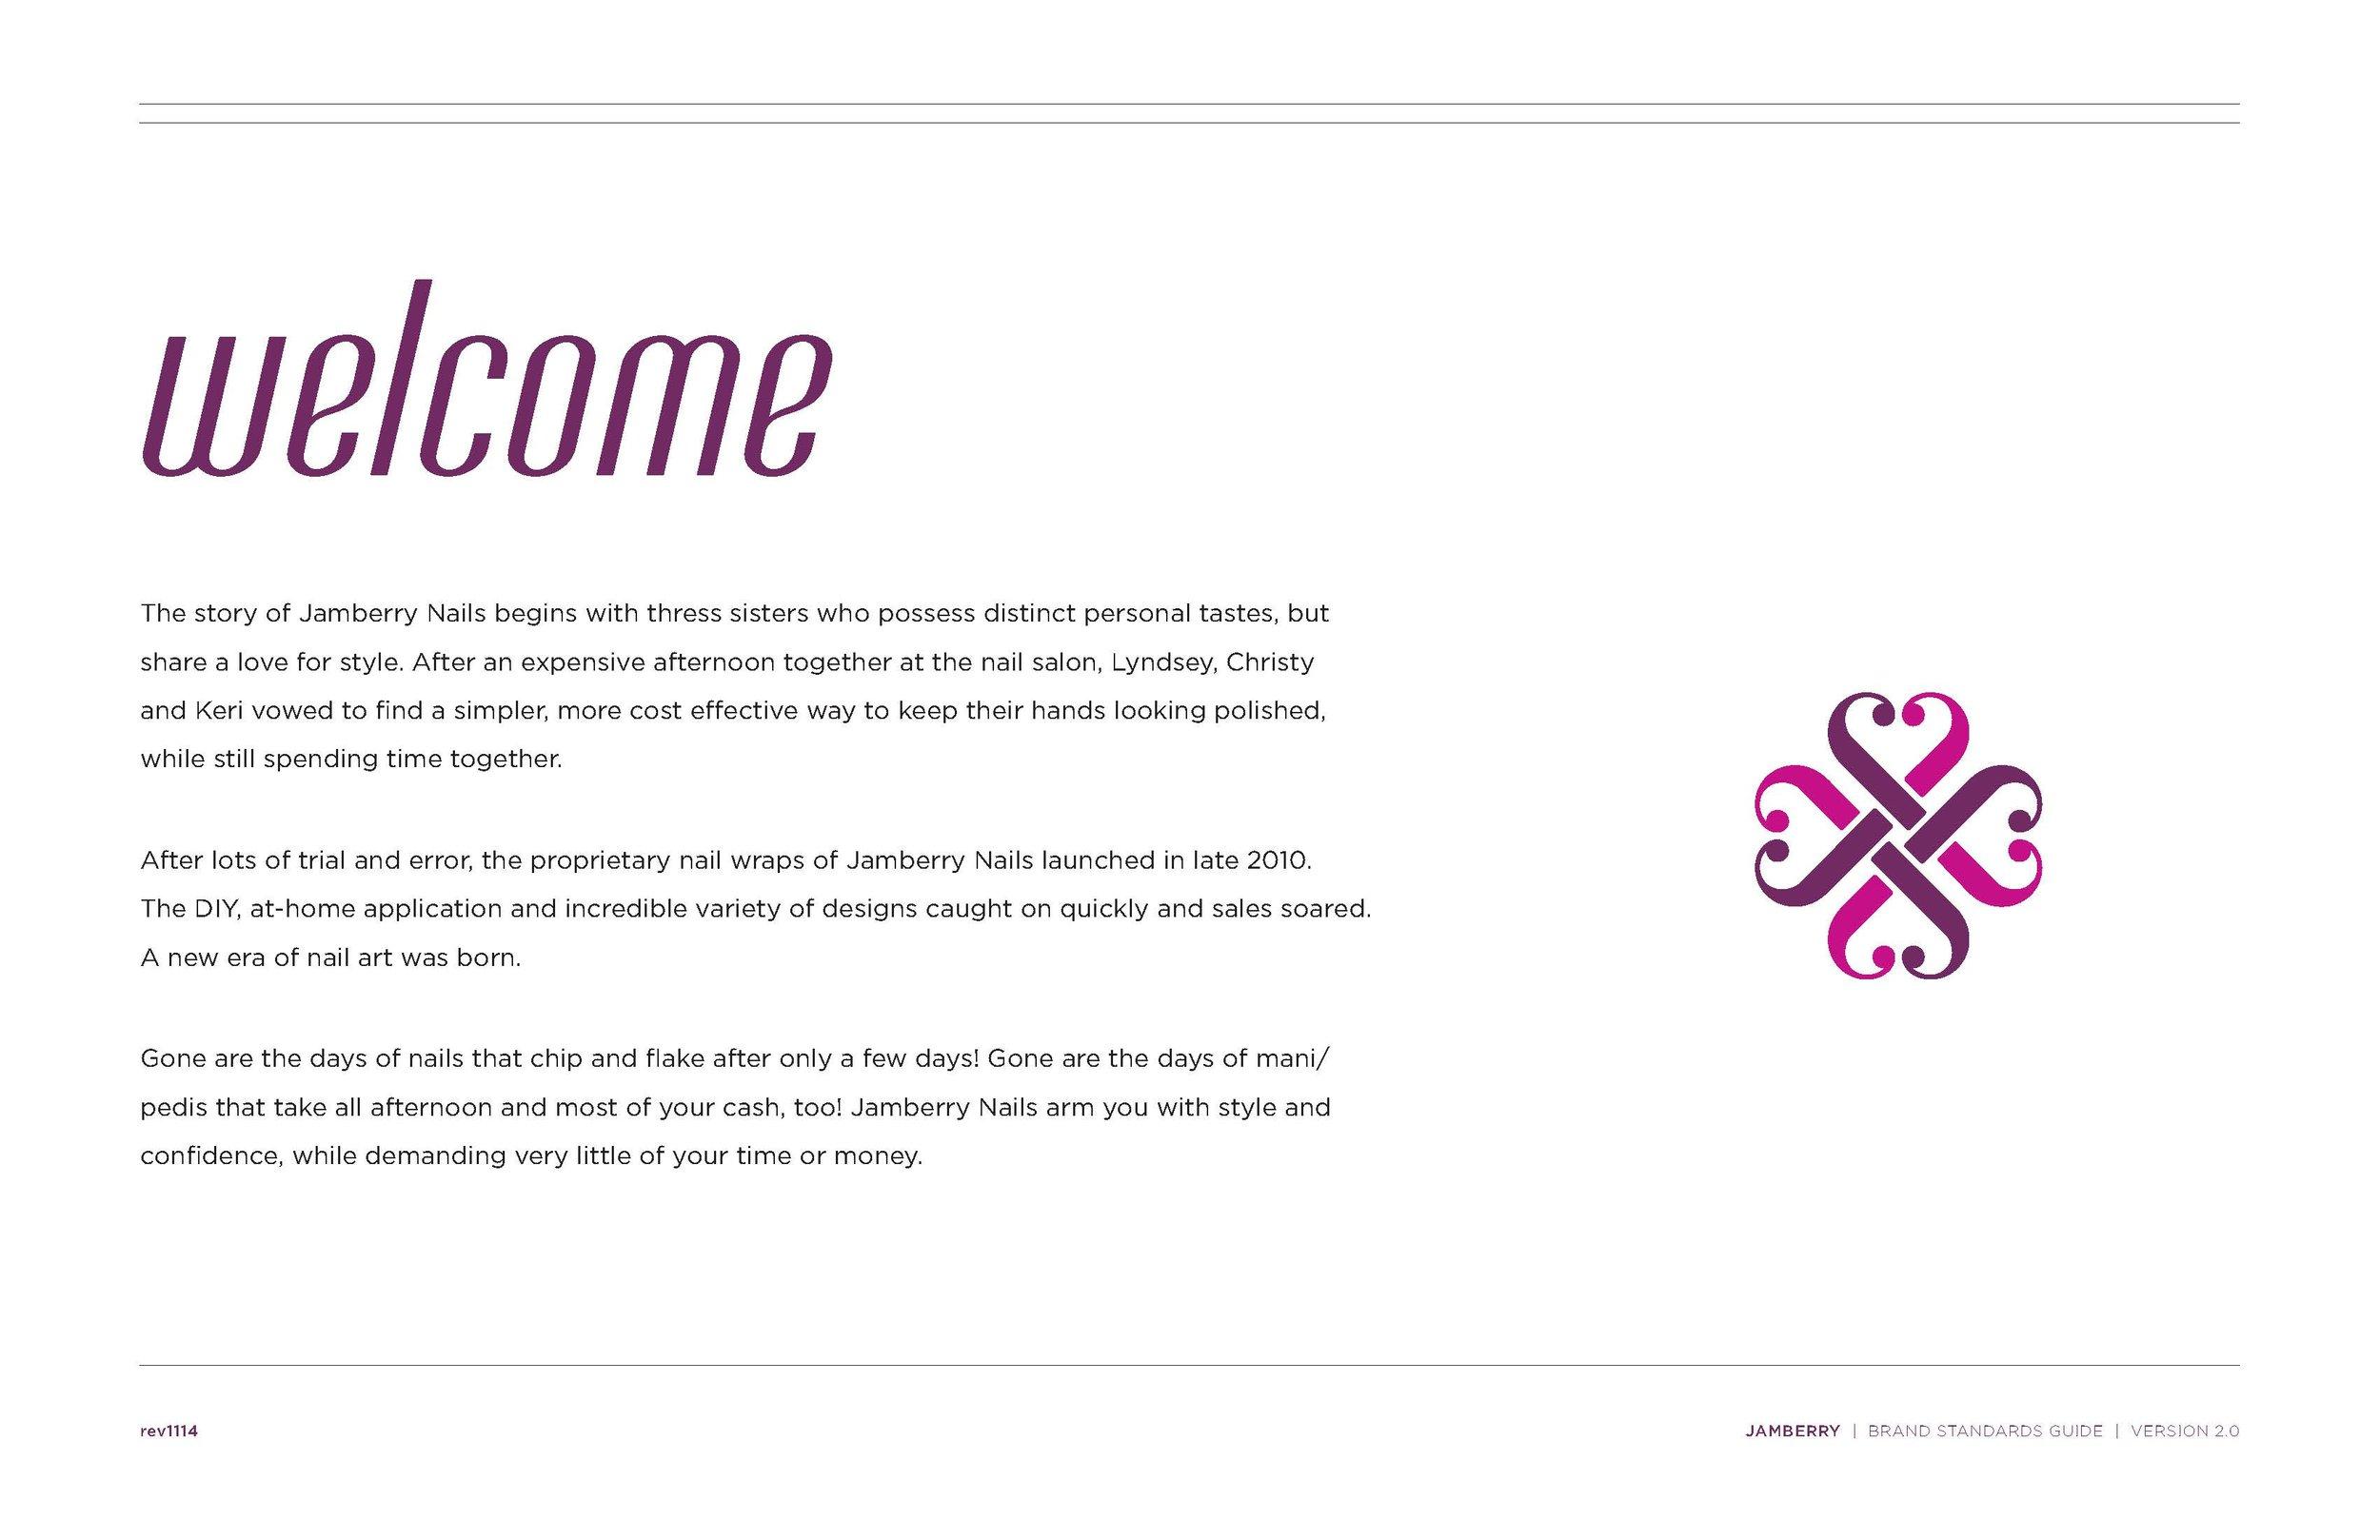 Jamberry GSG_v2.0_Page_02.jpg